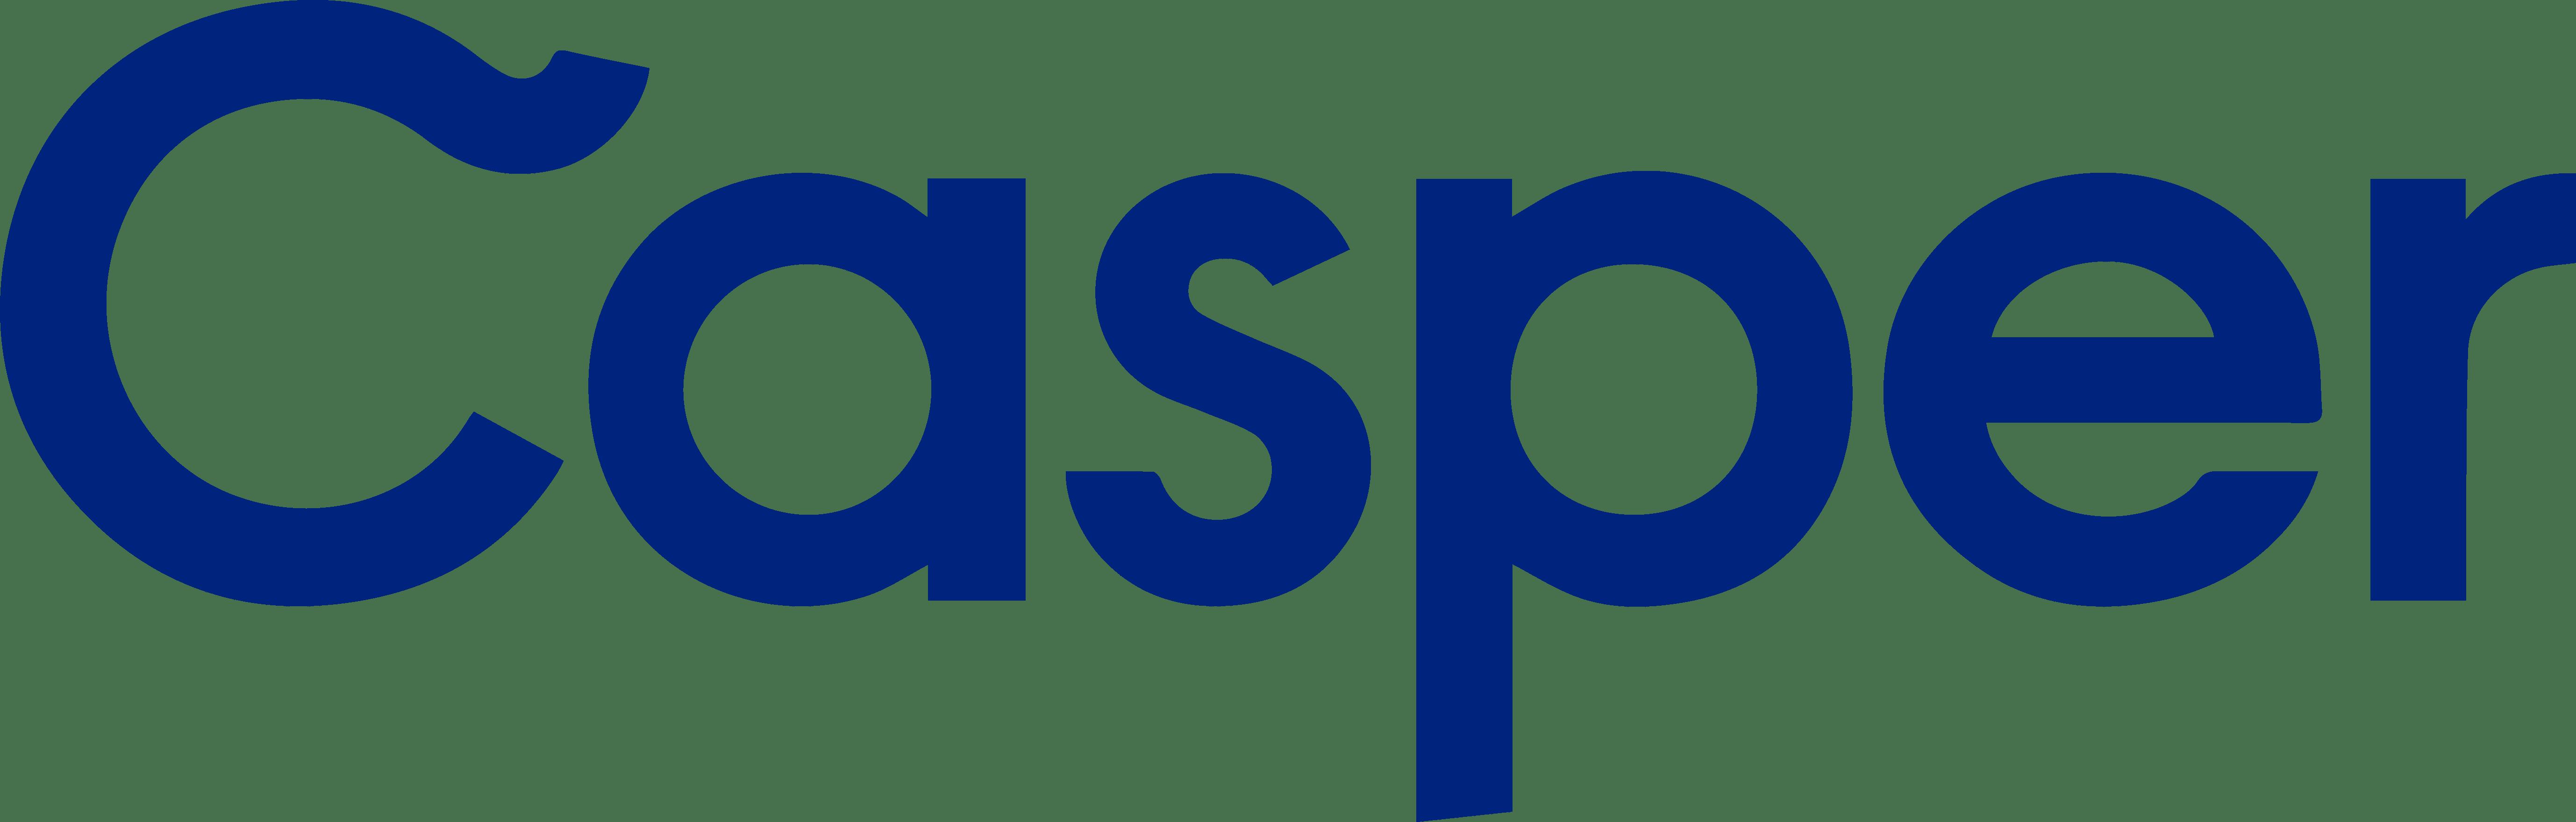 Casper Wave logo